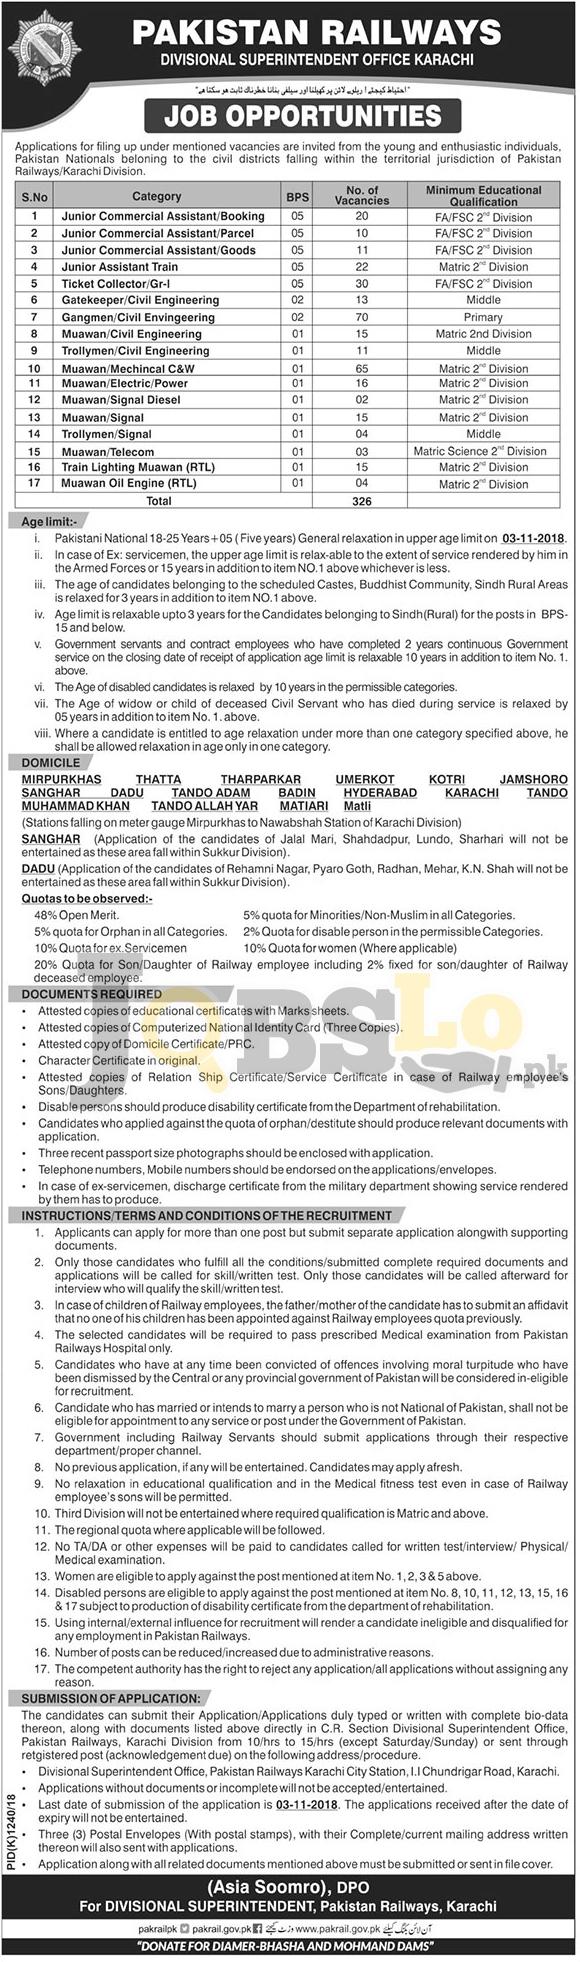 Pakistan Railway Jobs 2018 Karachi Sindh Division Latest Advertisement